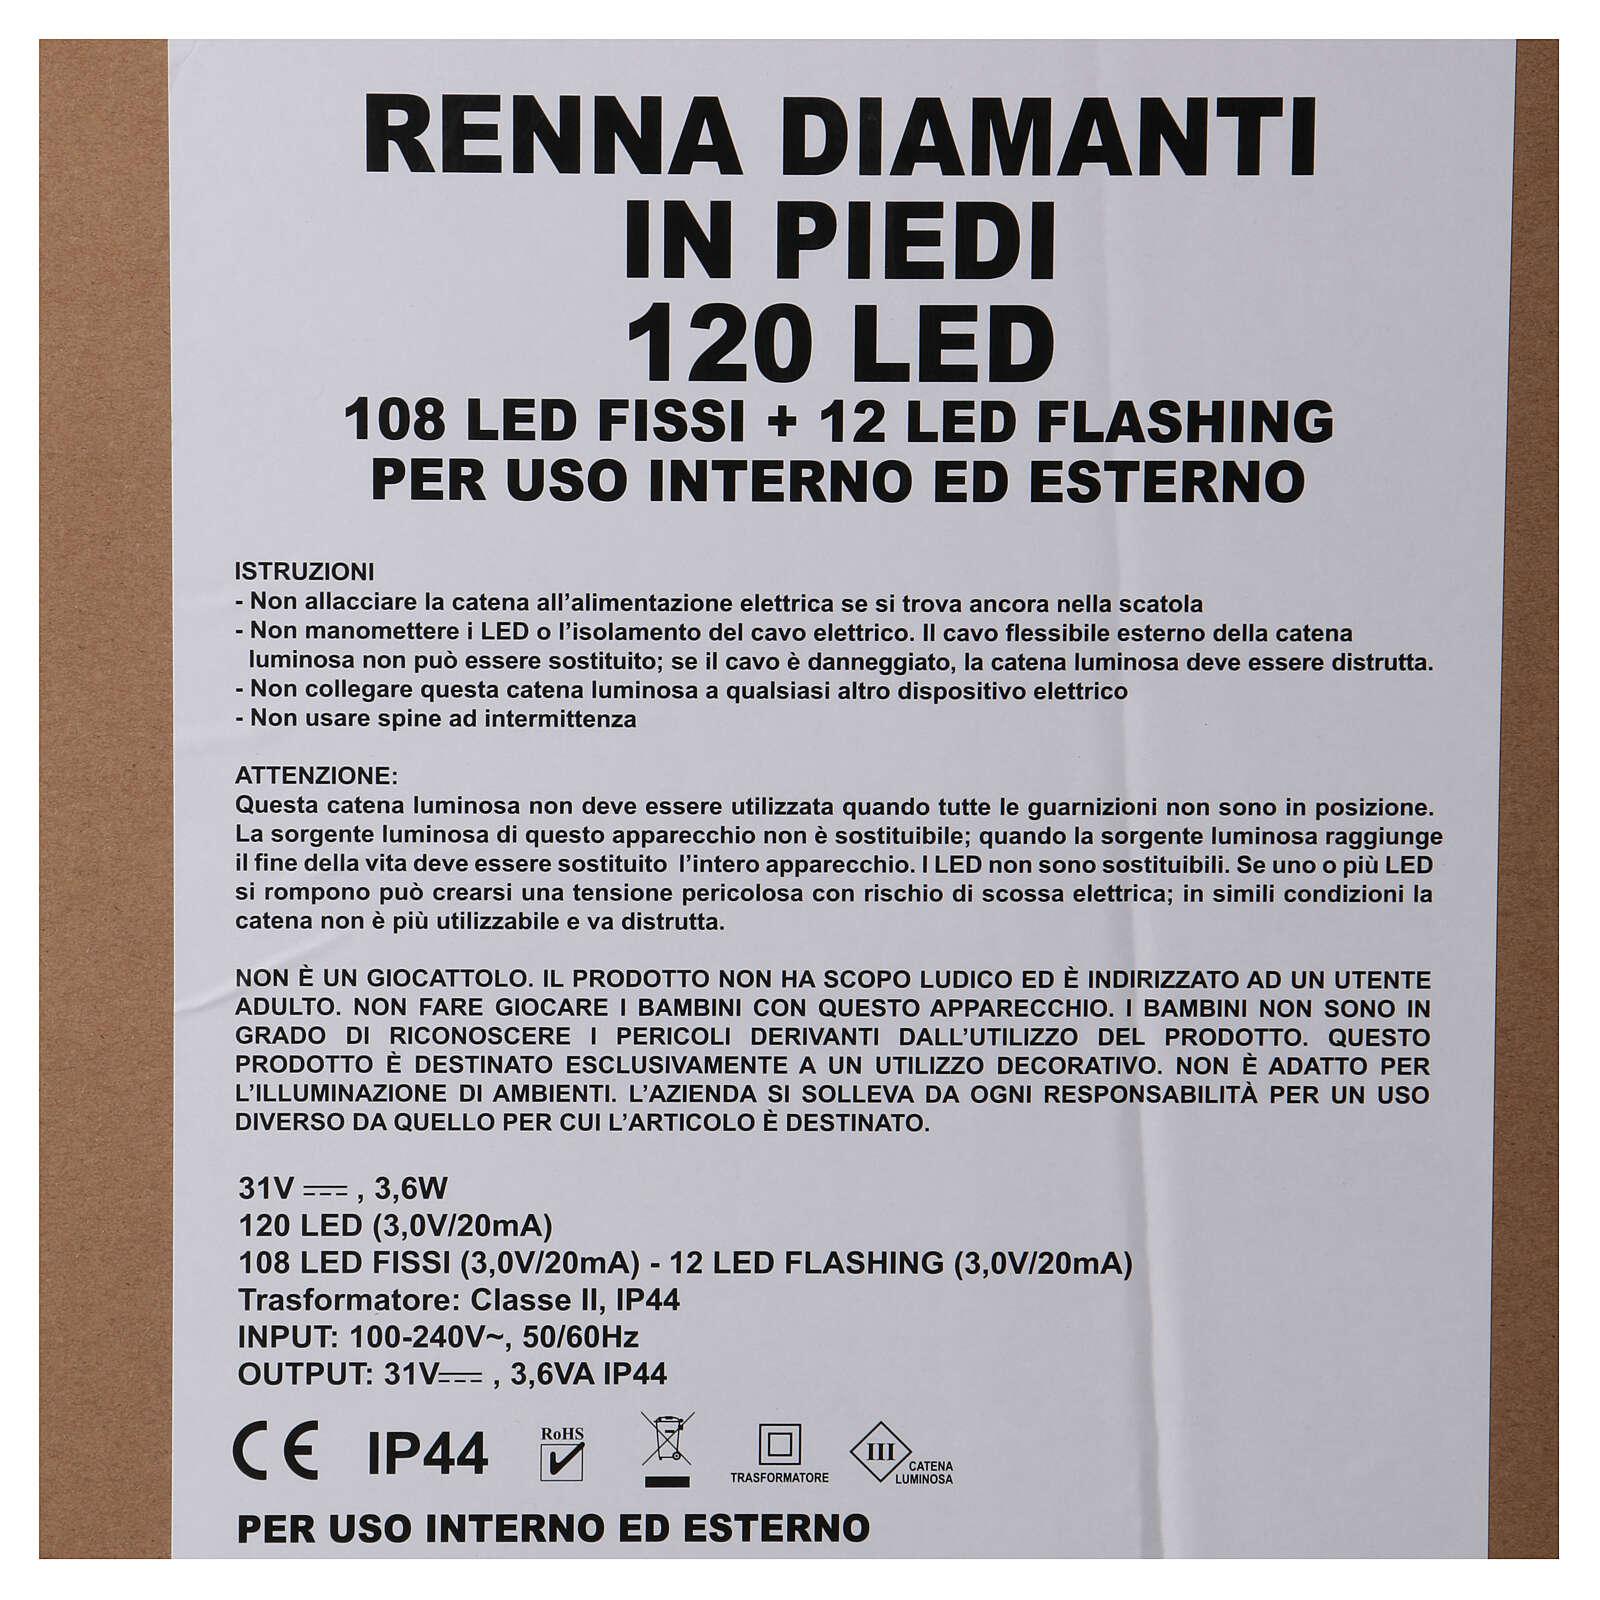 Luce renna in piedi diamanti 120 led h 92 cm uso int est bianco freddo 3